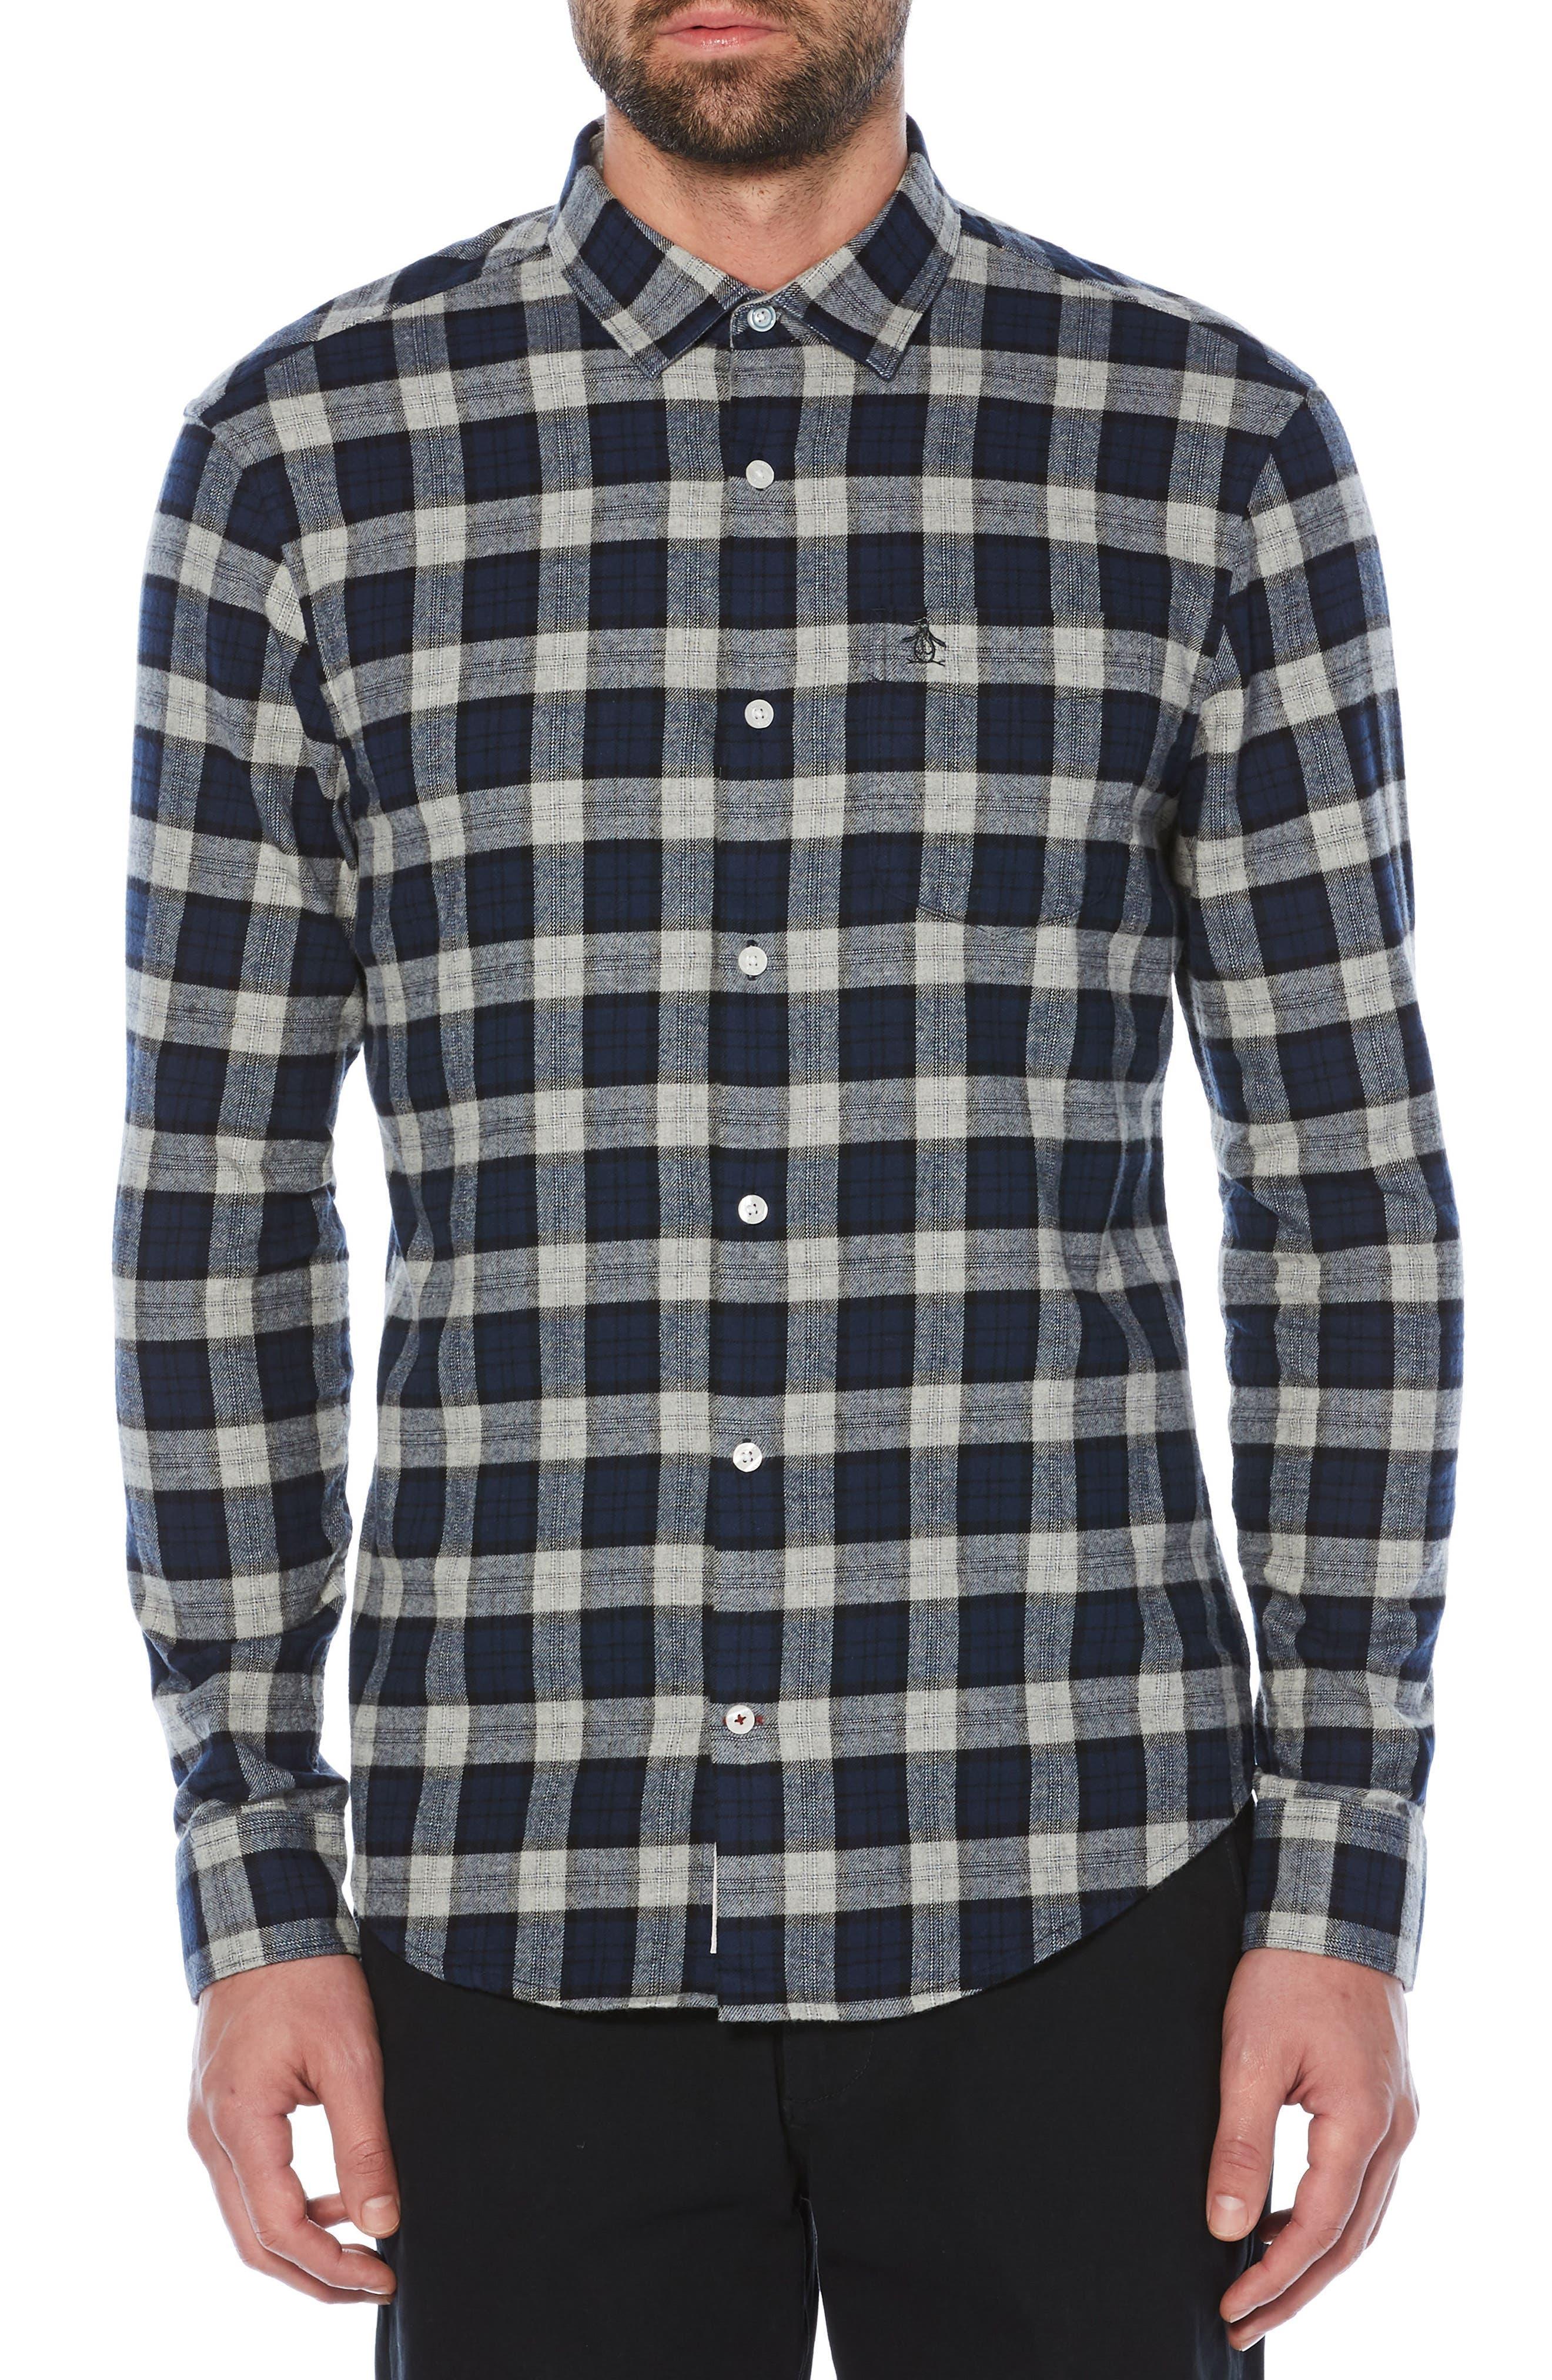 Alternate Image 1 Selected - Original Penguin Plaid Flannel Shirt